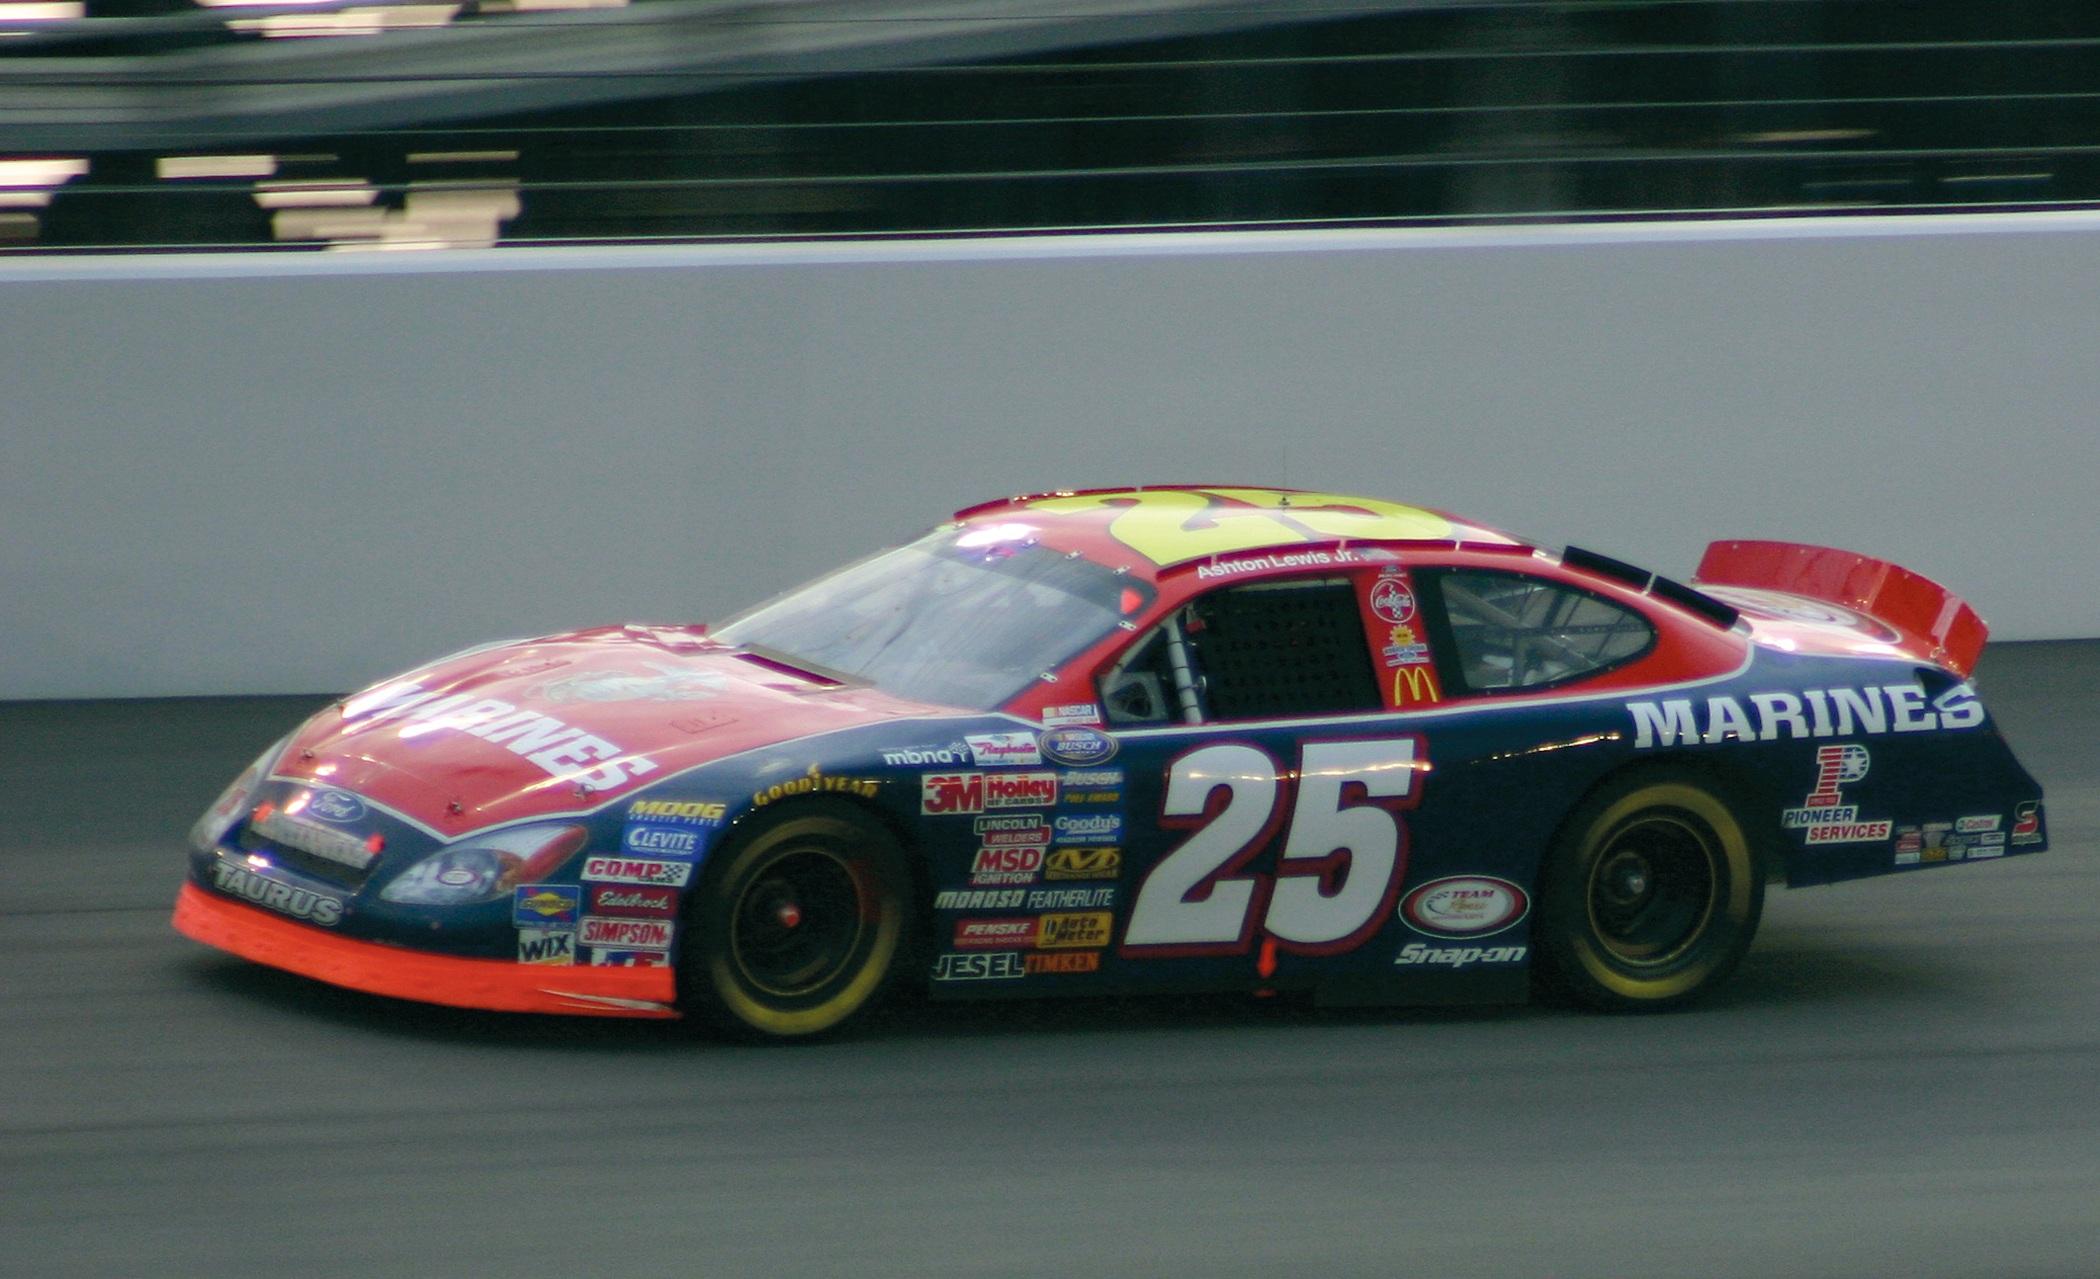 NASCAR Racing, Activity, Car, Championship, Nascar, HQ Photo